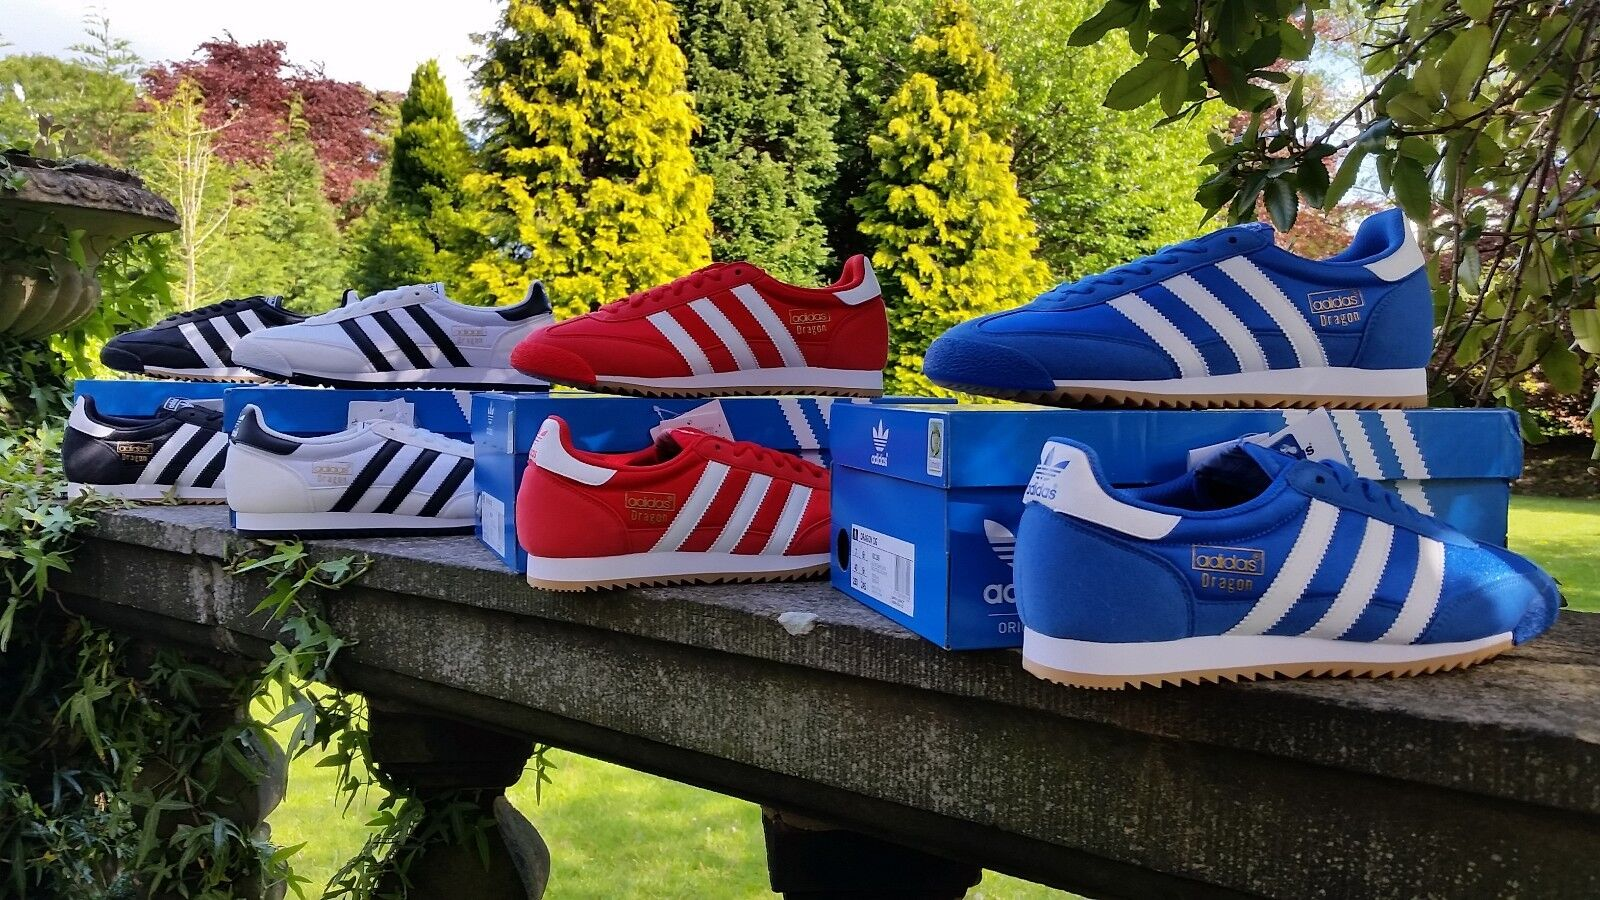 Adidas Originals Para Hombre Dragón Moda tenis Varios Colors BNIBWT Talla UK 6-12